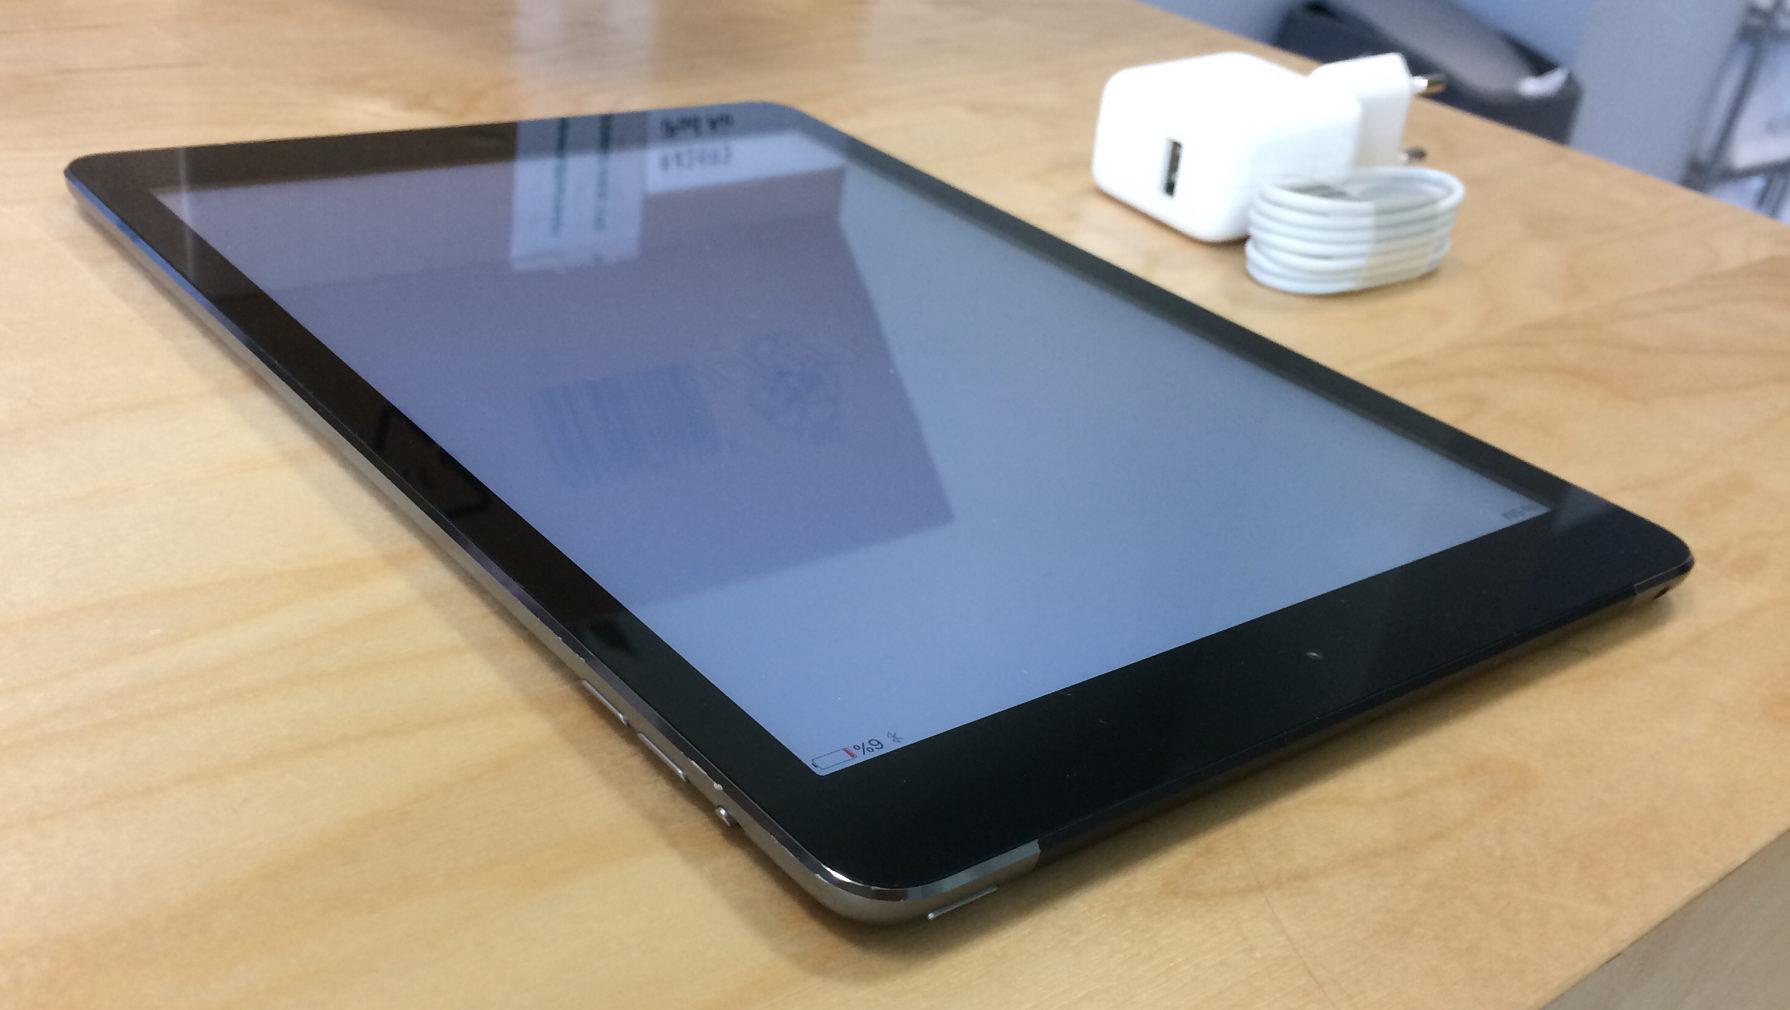 iPad Air (Wi-Fi + 4G), 64 GB, Space Gray, imagen 5